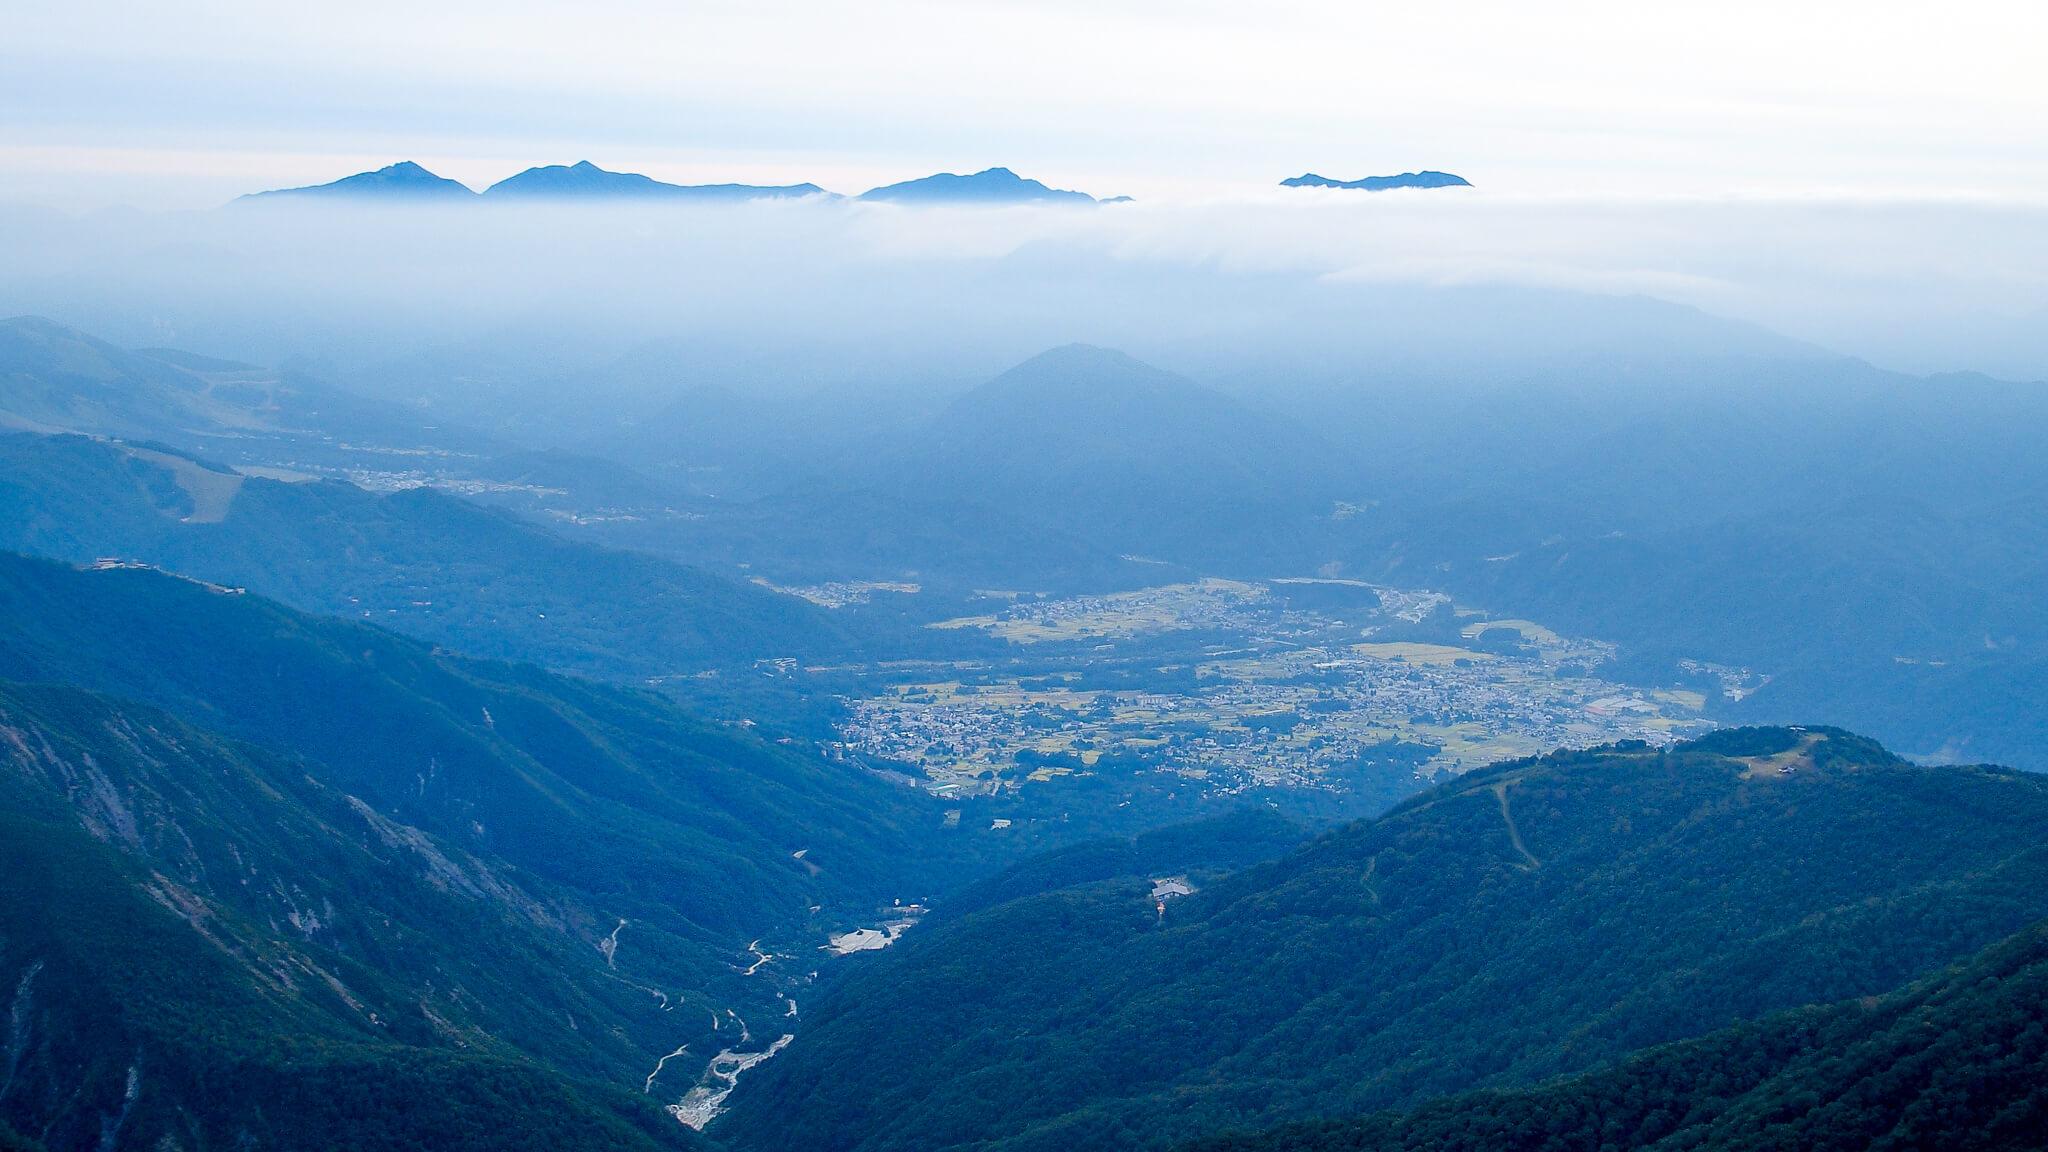 五竜岳・遠見尾根と八方尾根と白馬村